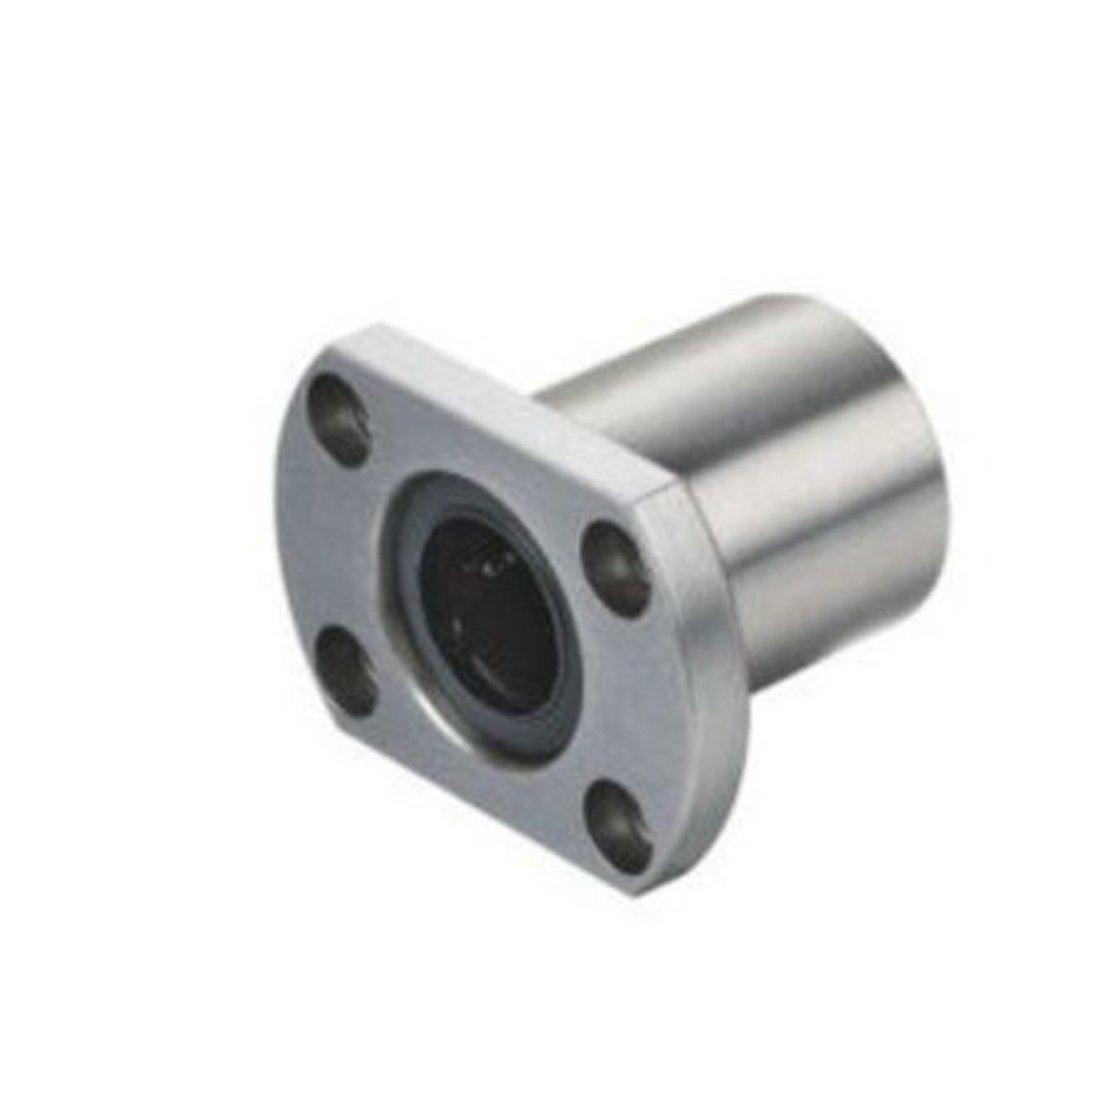 2pcs LMH6UU flange linear bushing linear bearing CNC part